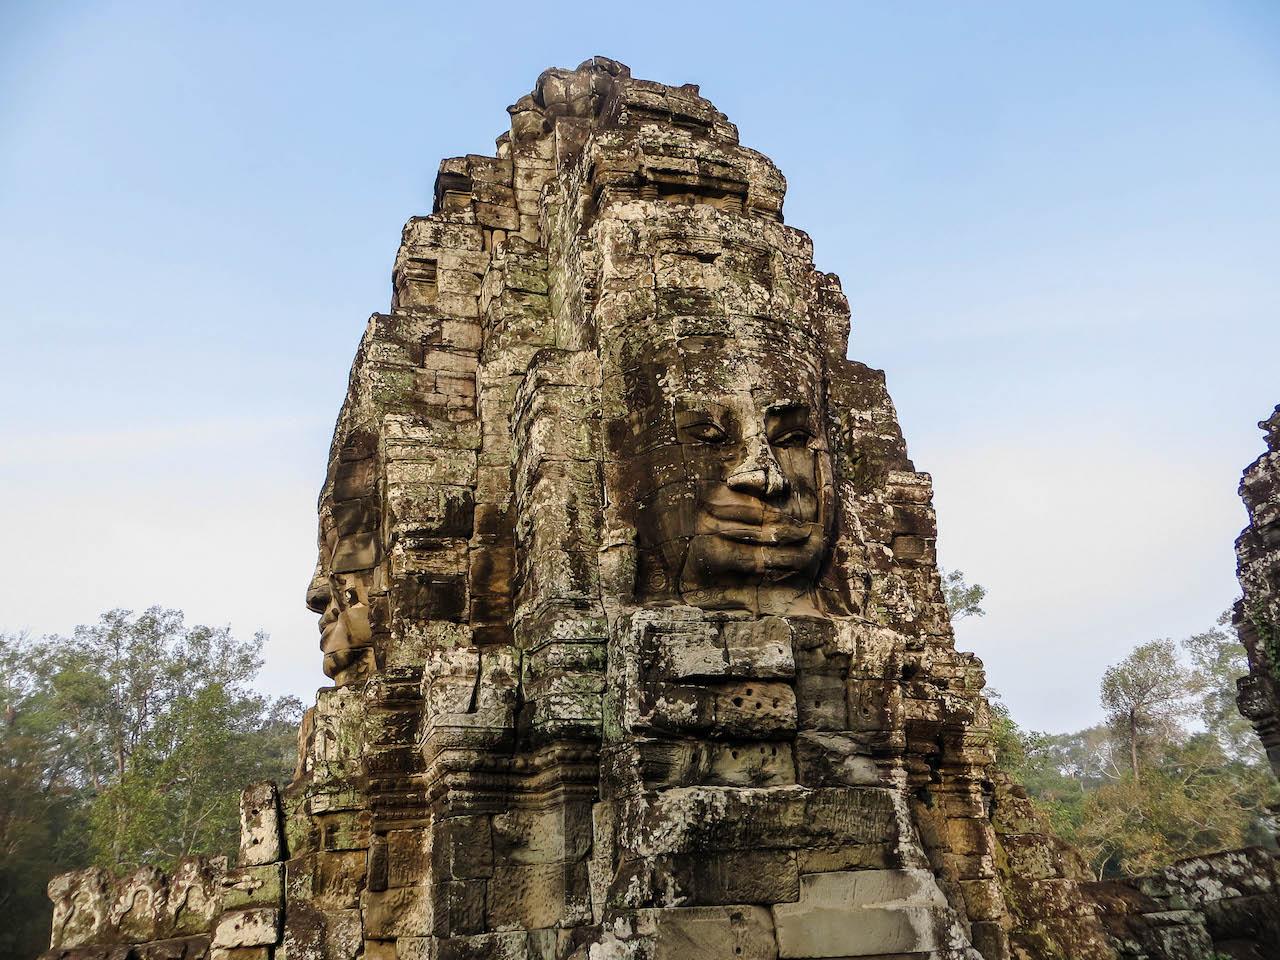 Der Tempel Bayon in Kambodscha.